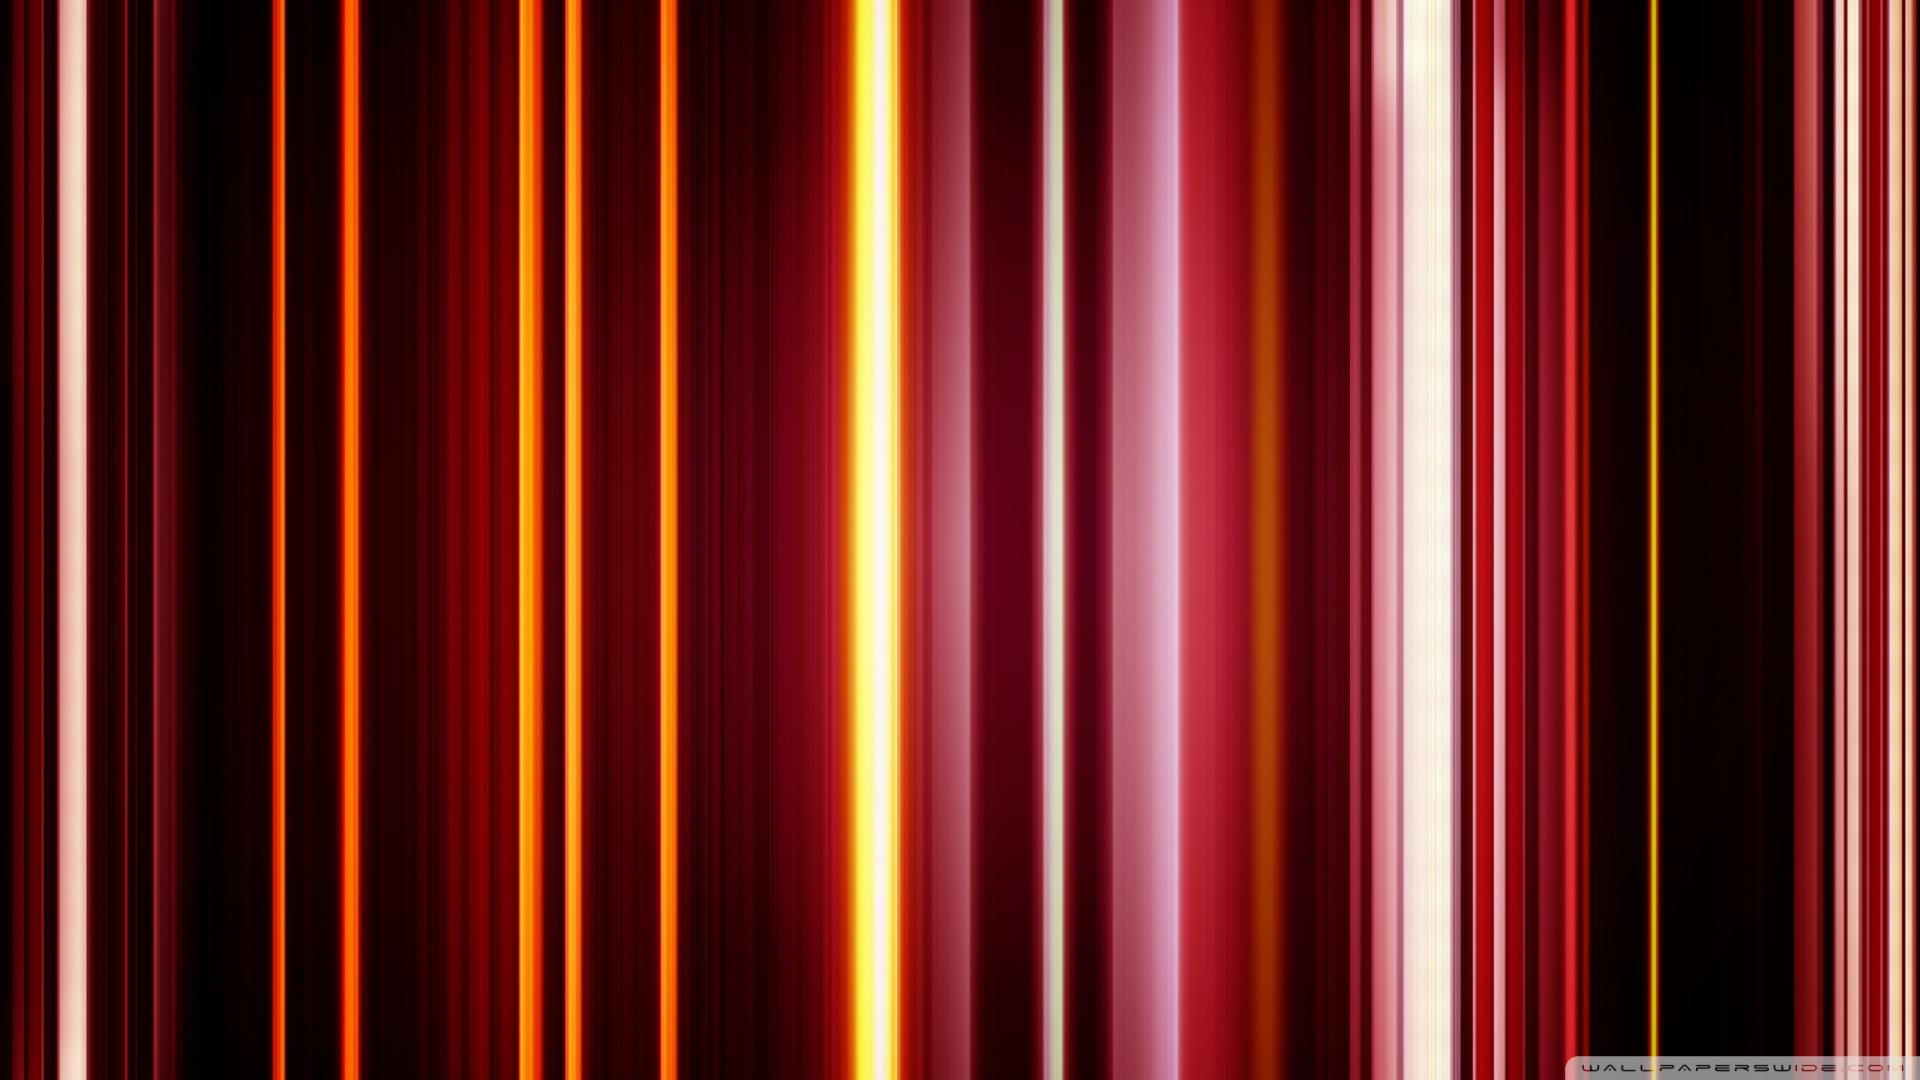 Red Neon Wallpaper - WallpaperSafari Red Neon Background